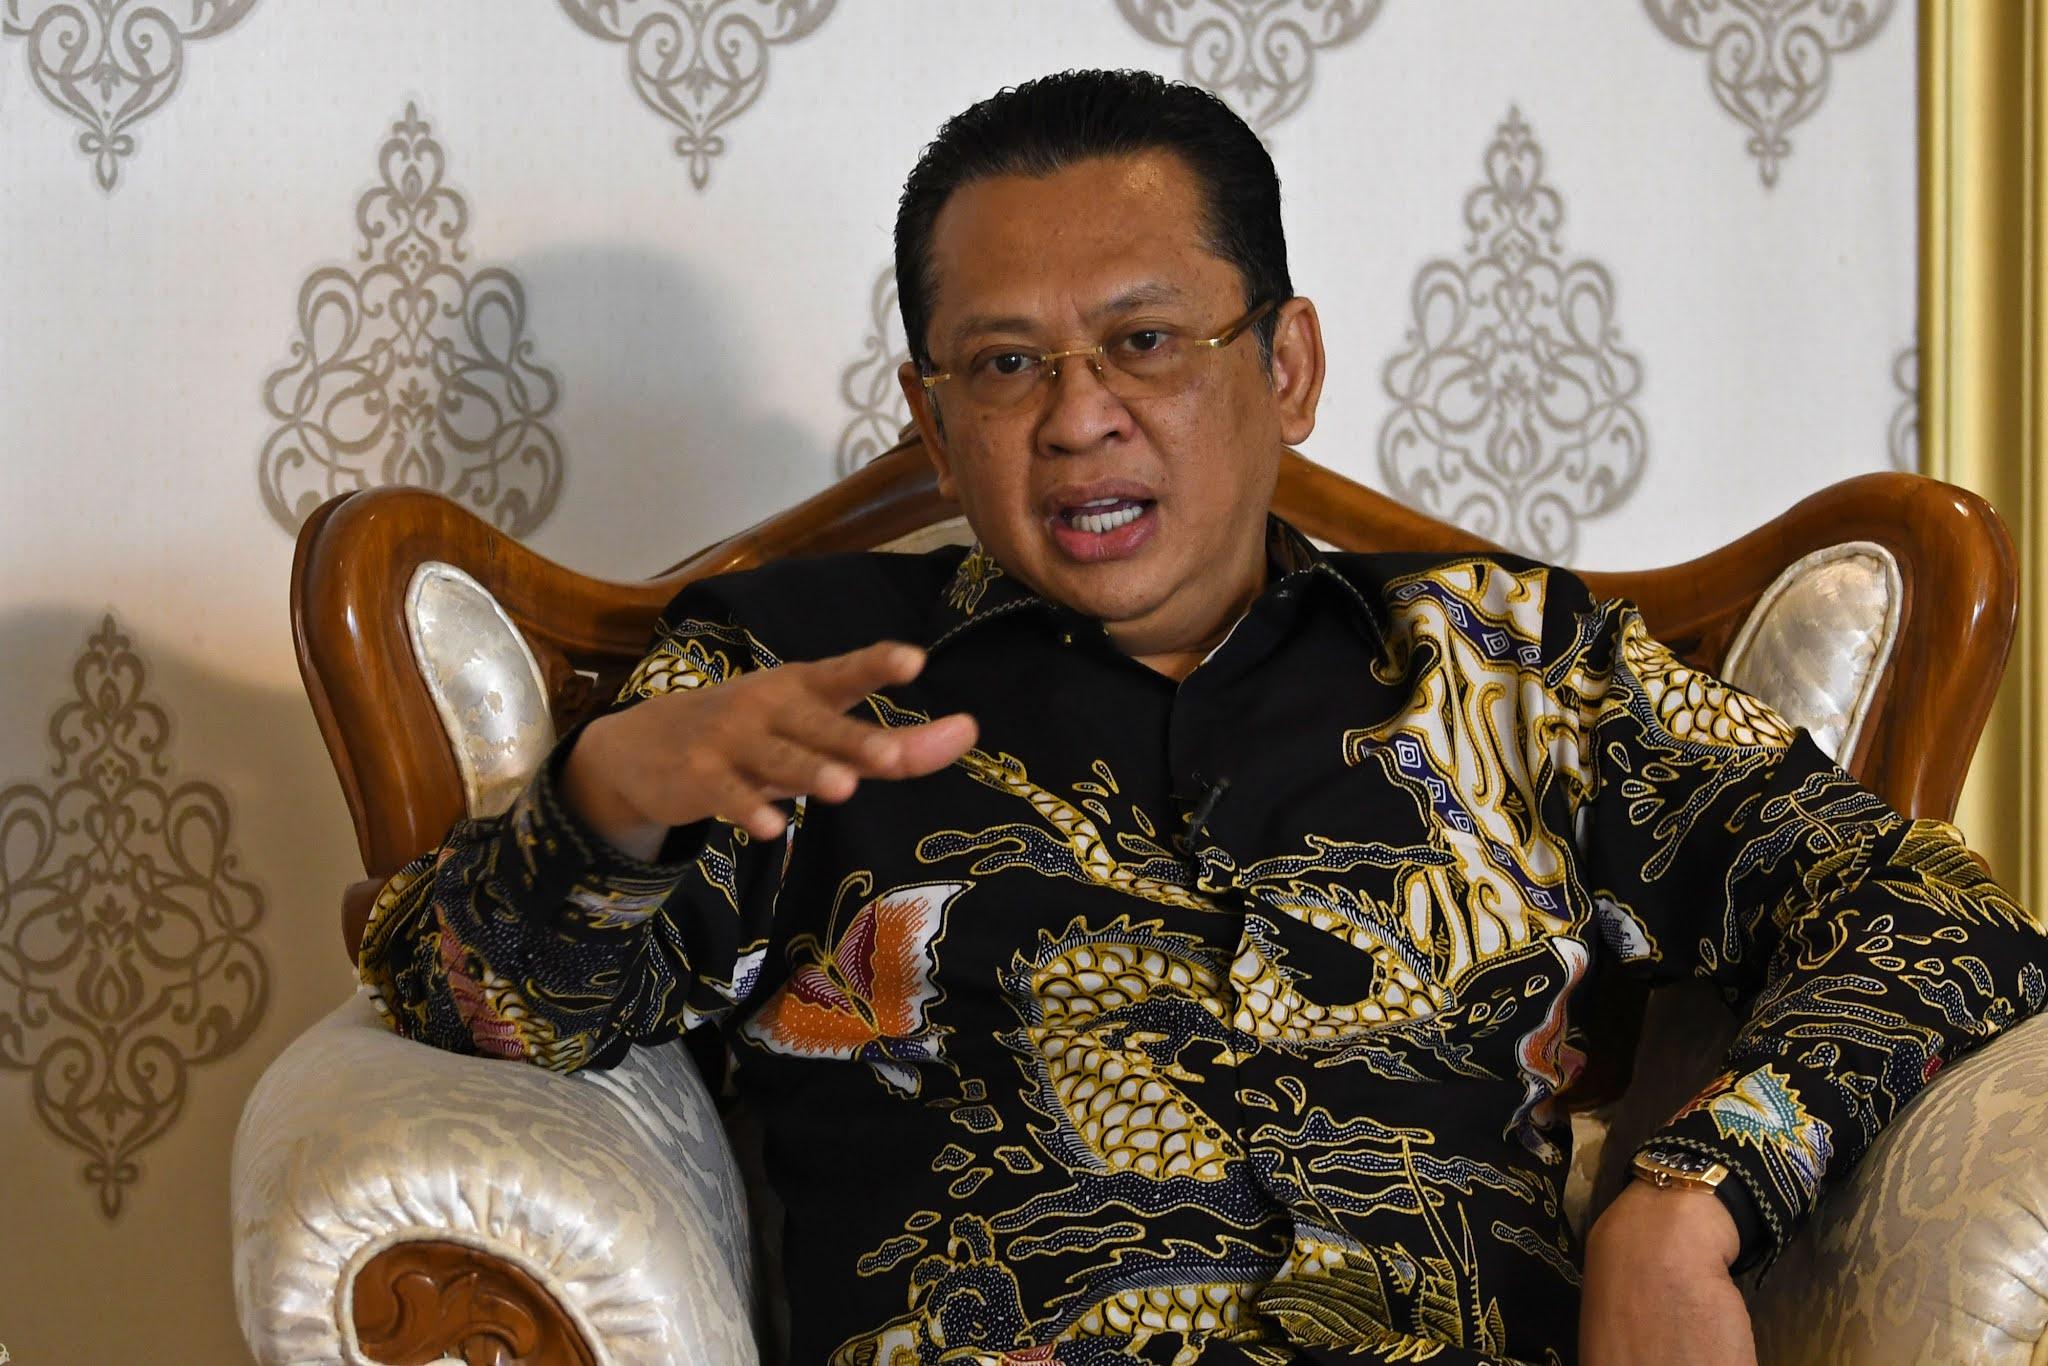 KKB Semakin Brutal, MPR: Sikat Habis KKB Papua, Urusan HAM Belakangan!